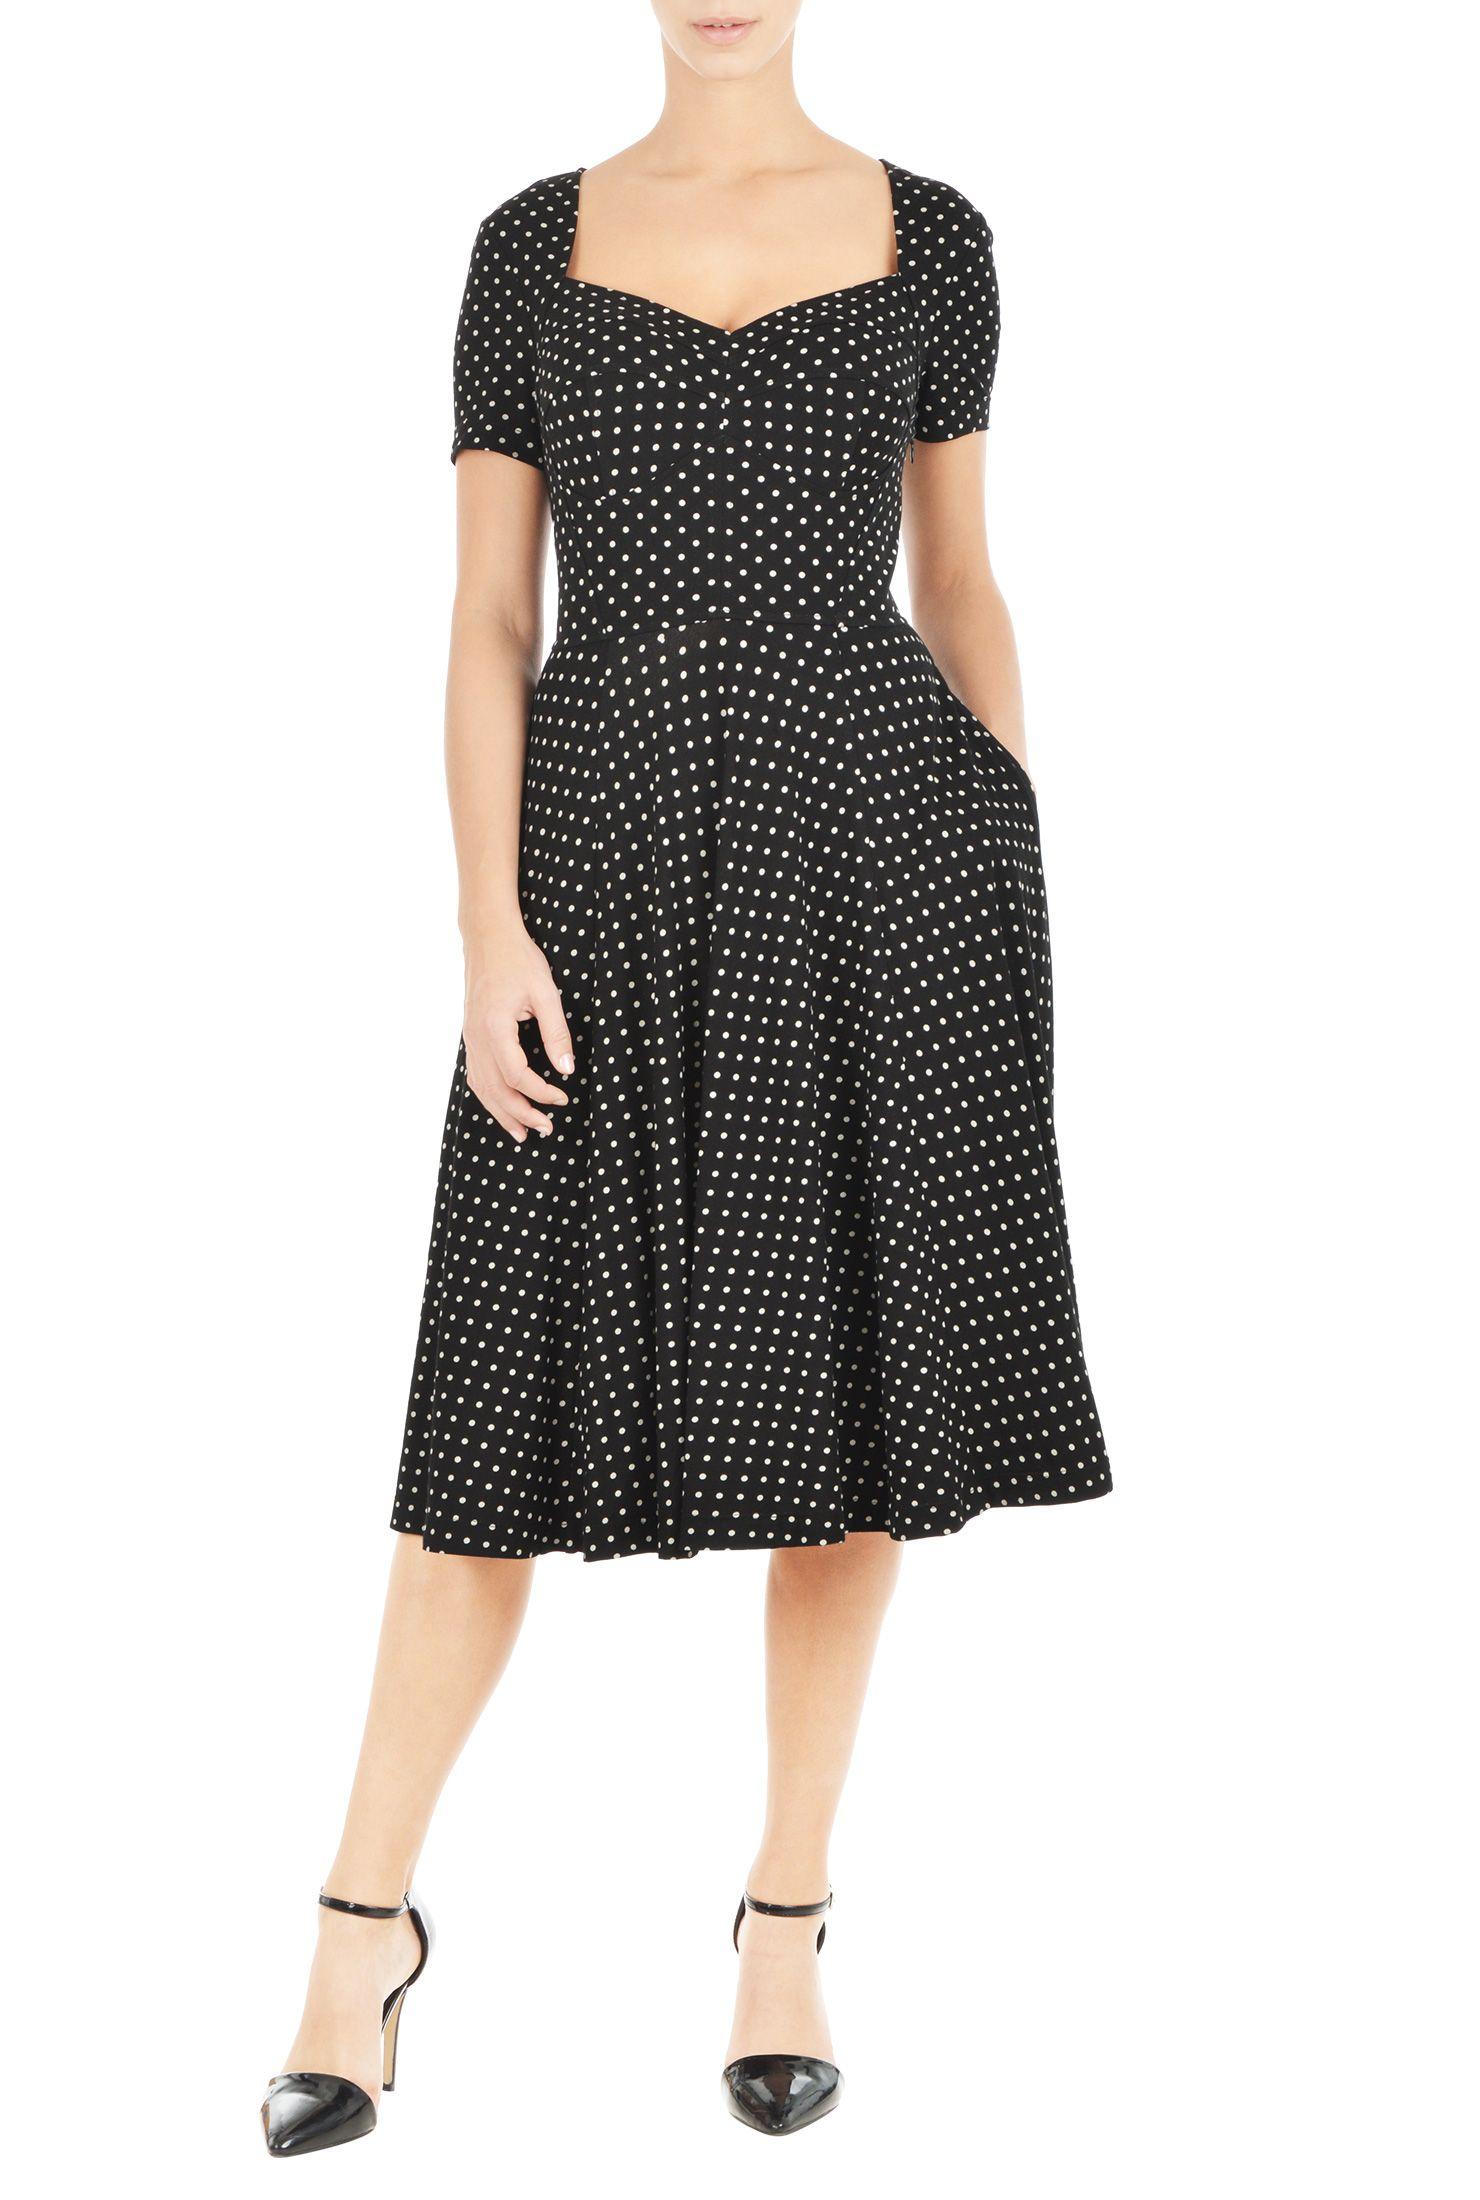 Below knee length dresses blackwhite dresses corset bodice